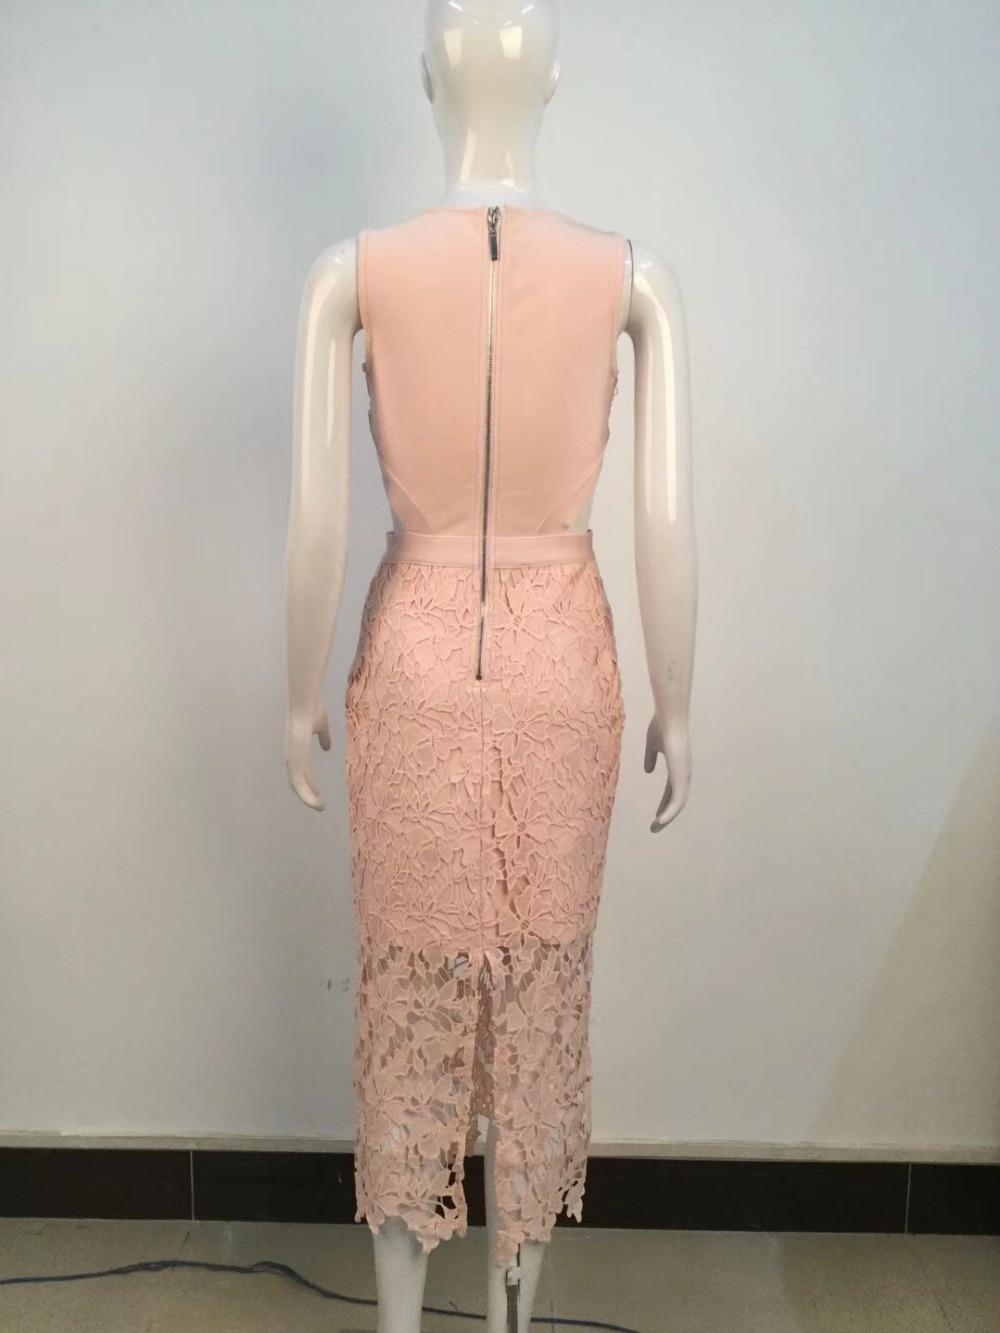 Robes Arrivée Keyhole Dos Moulante Nouvelle 2018 Rose Robe Éclair Party Fermeture Bandage En Gros Femmes Celebrity xgqHw1gOB